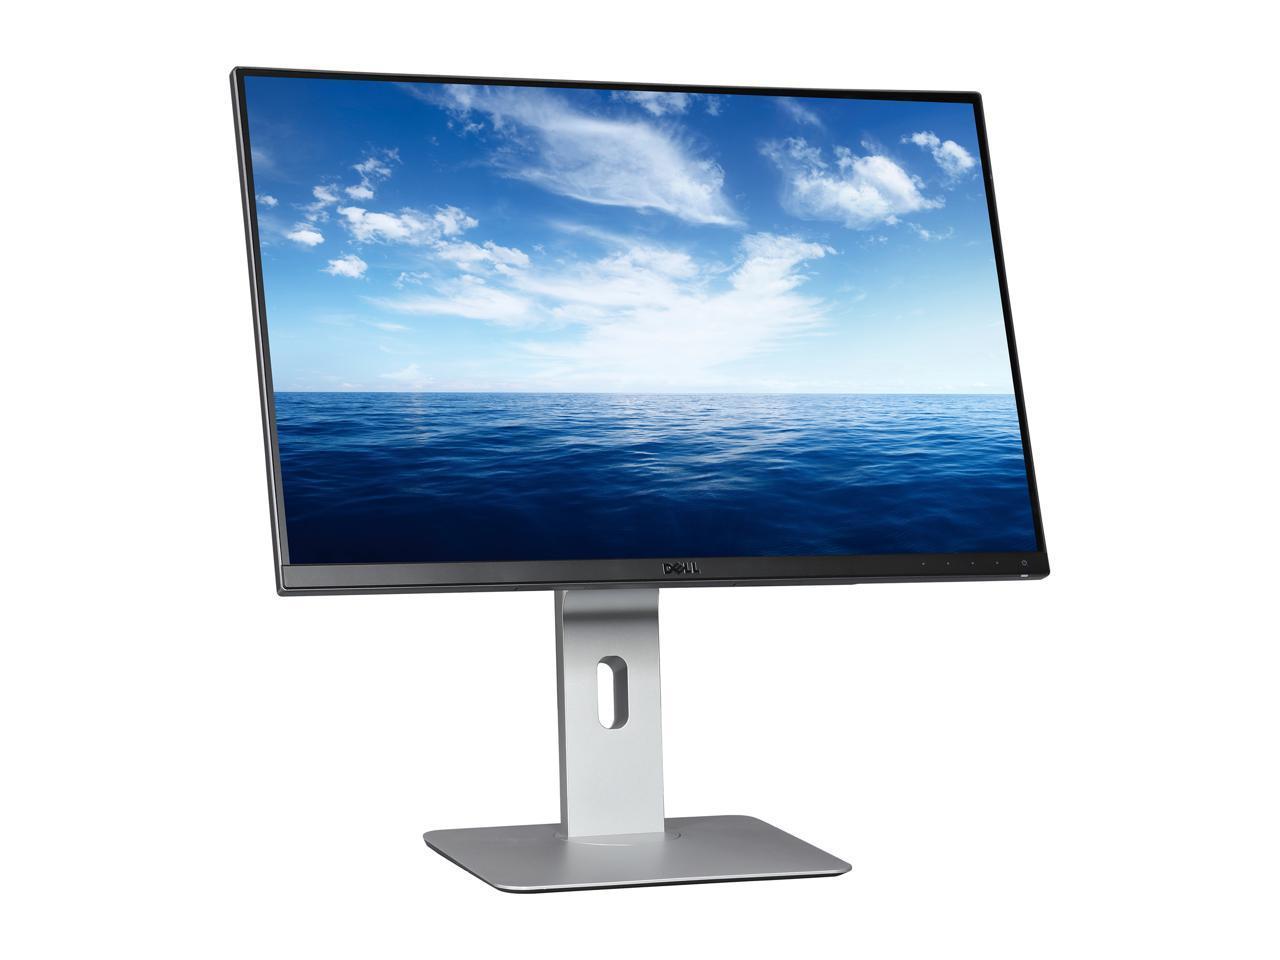 Monitor 24' Dell Ultrasharp U2415